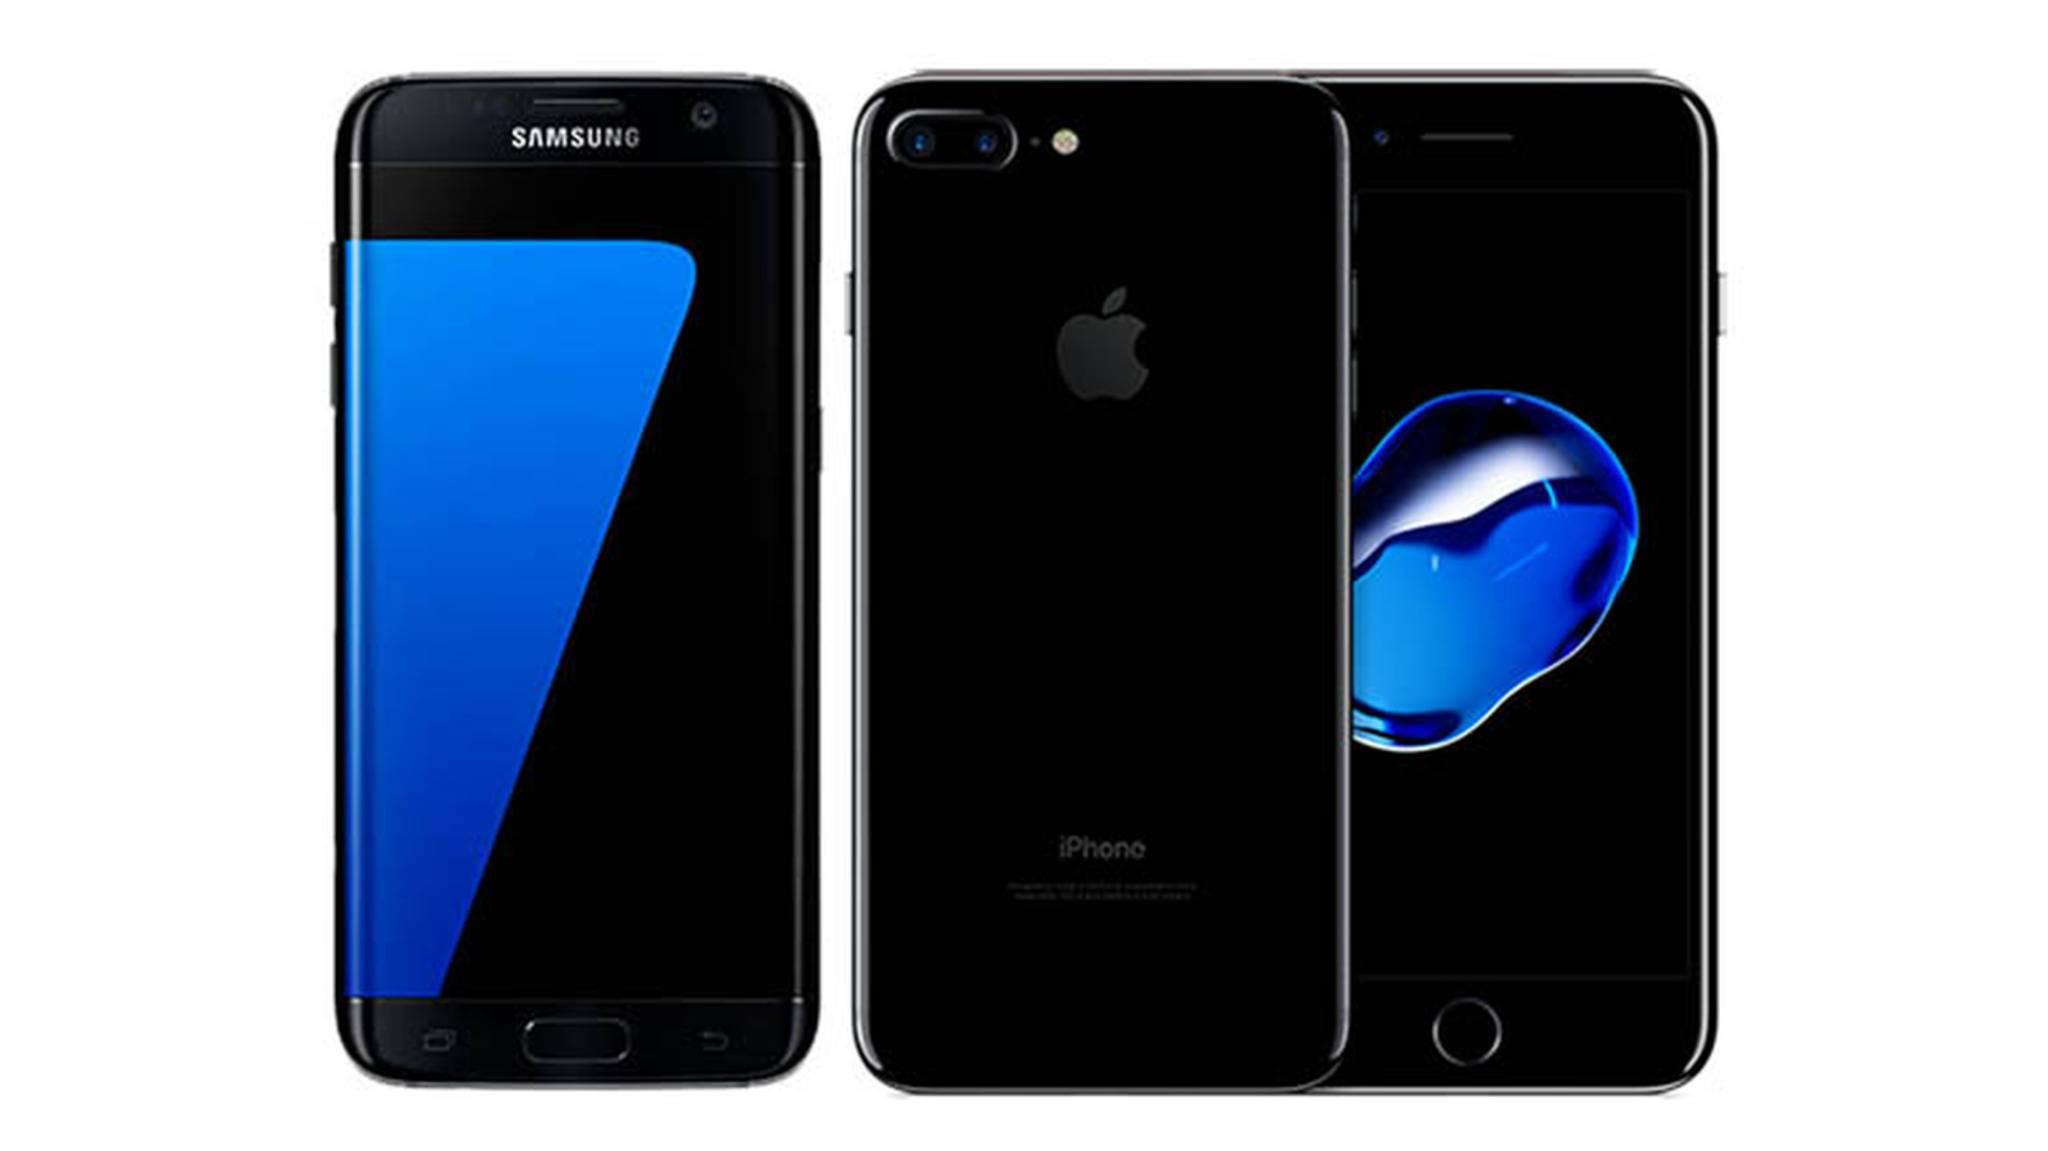 galaxy-s7-edge-iphone-7-plus